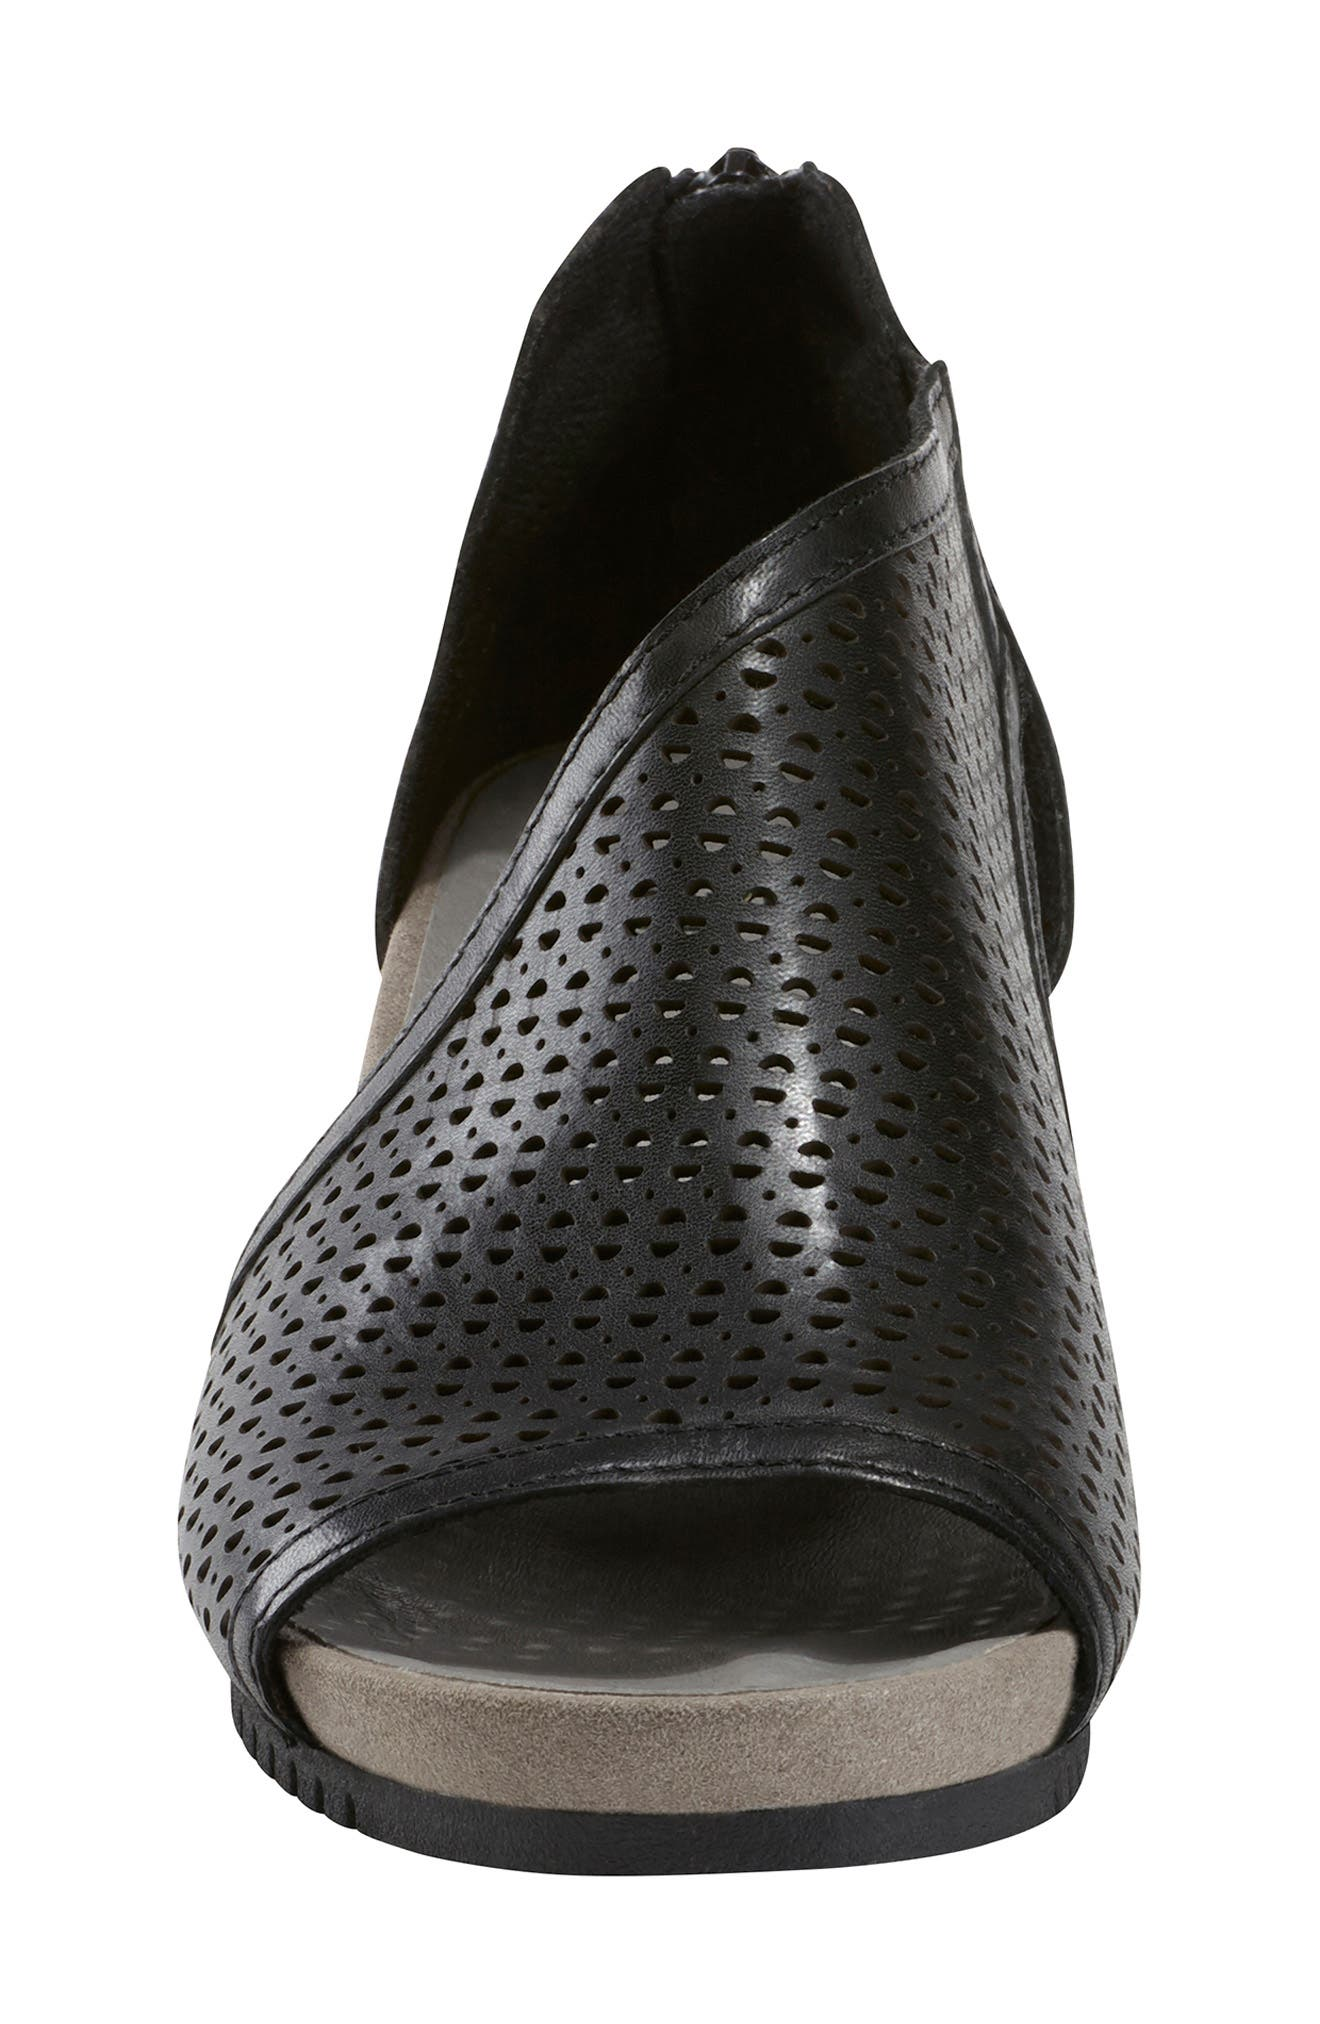 Capricorn Wedge Sandal,                             Alternate thumbnail 4, color,                             BLACK LEATHER